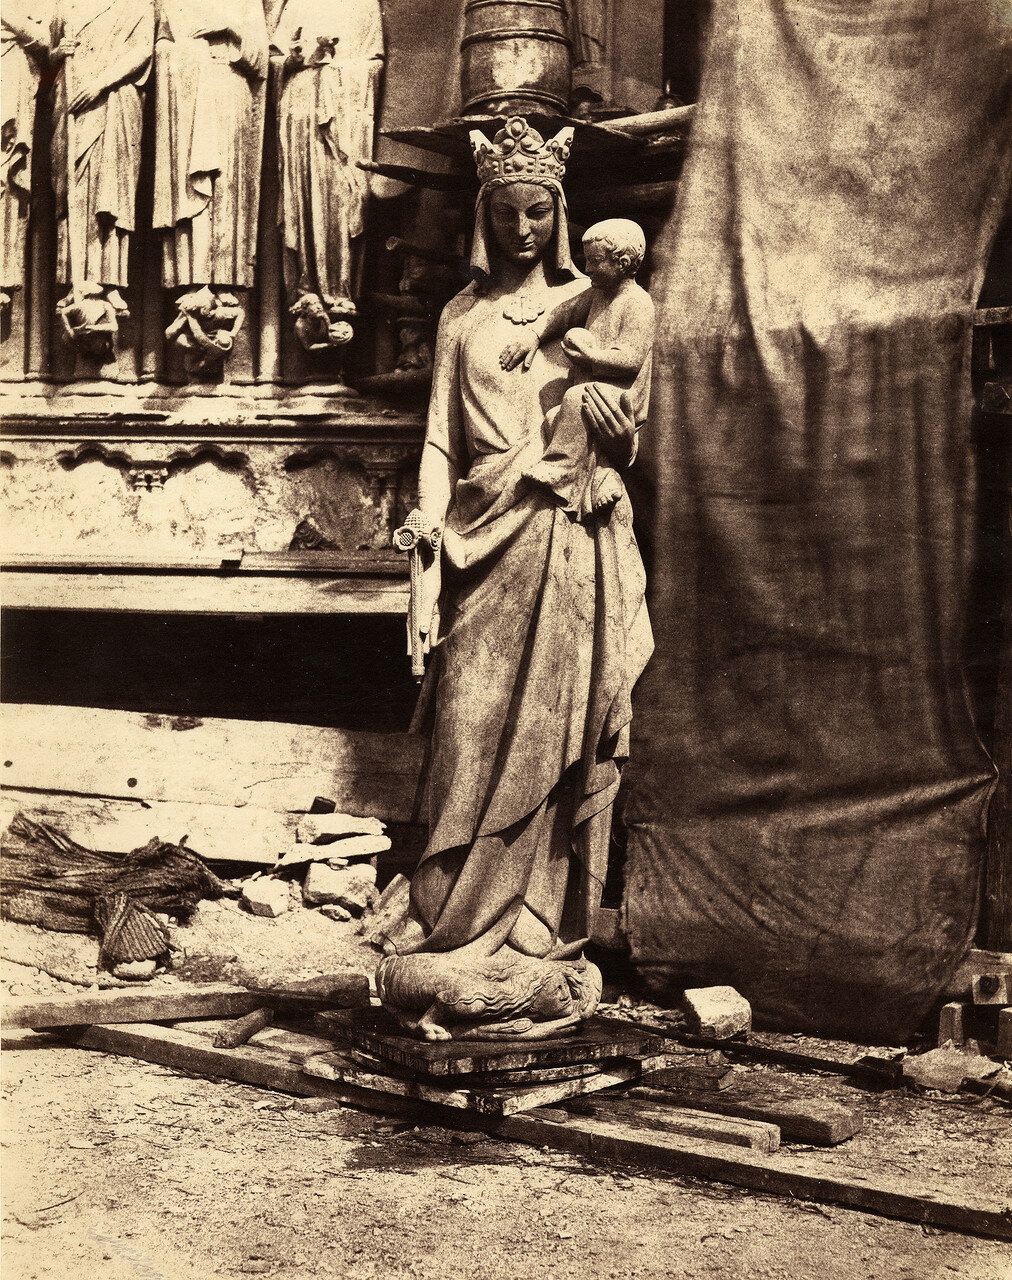 1851. Нотр-Дам. Скульптура Богоматери с младенцем